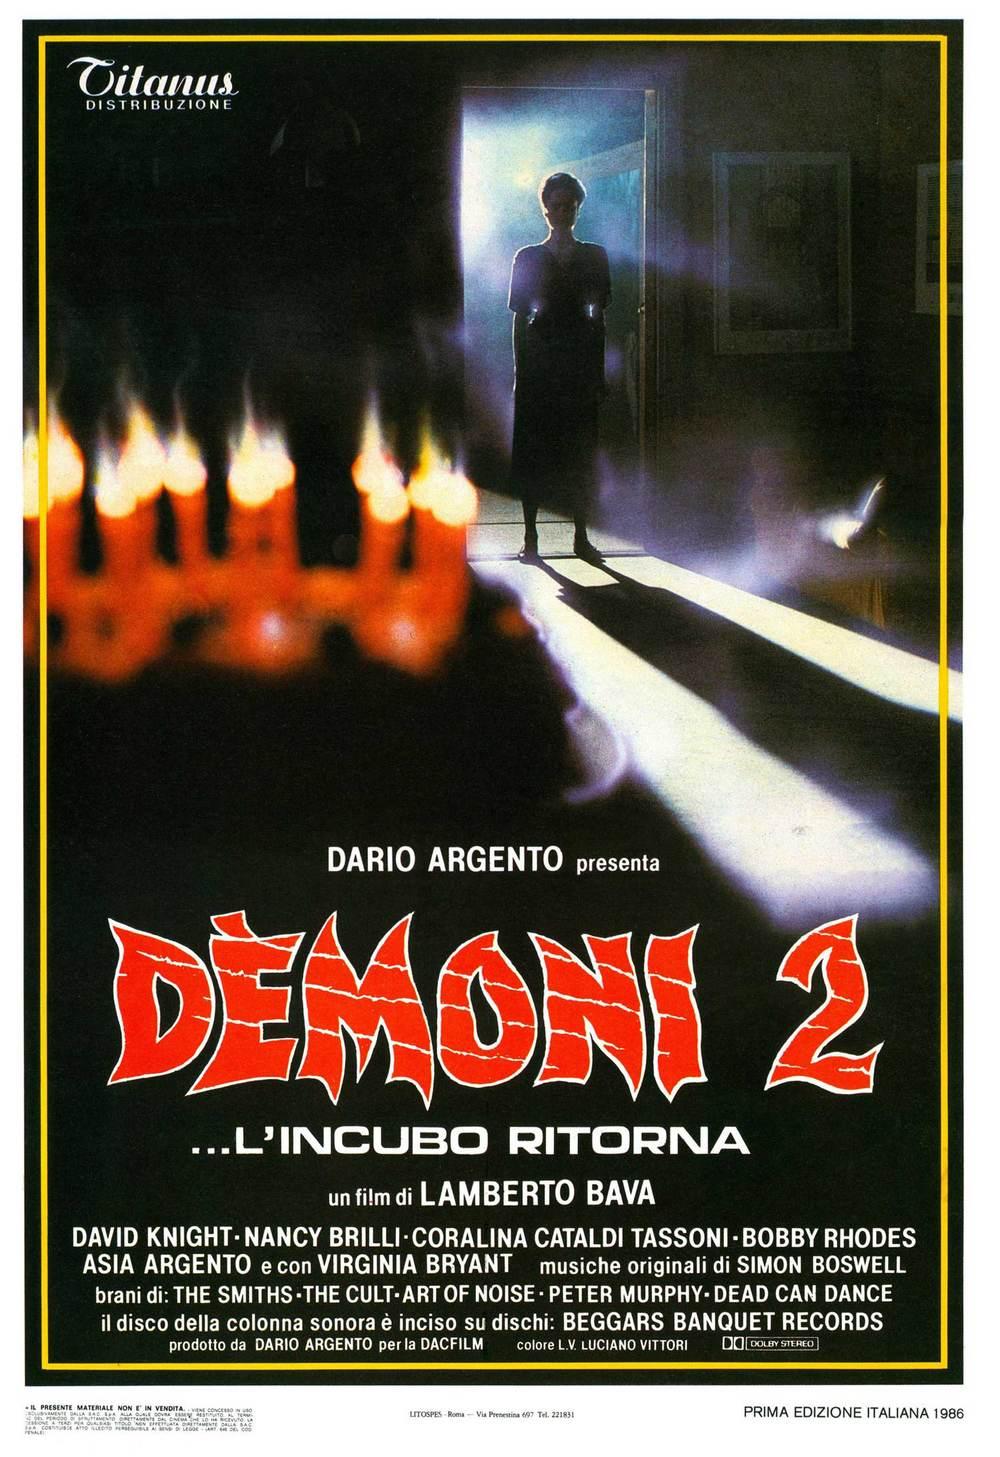 Demons 2 Starring Coralian Cataldi-Tassoni